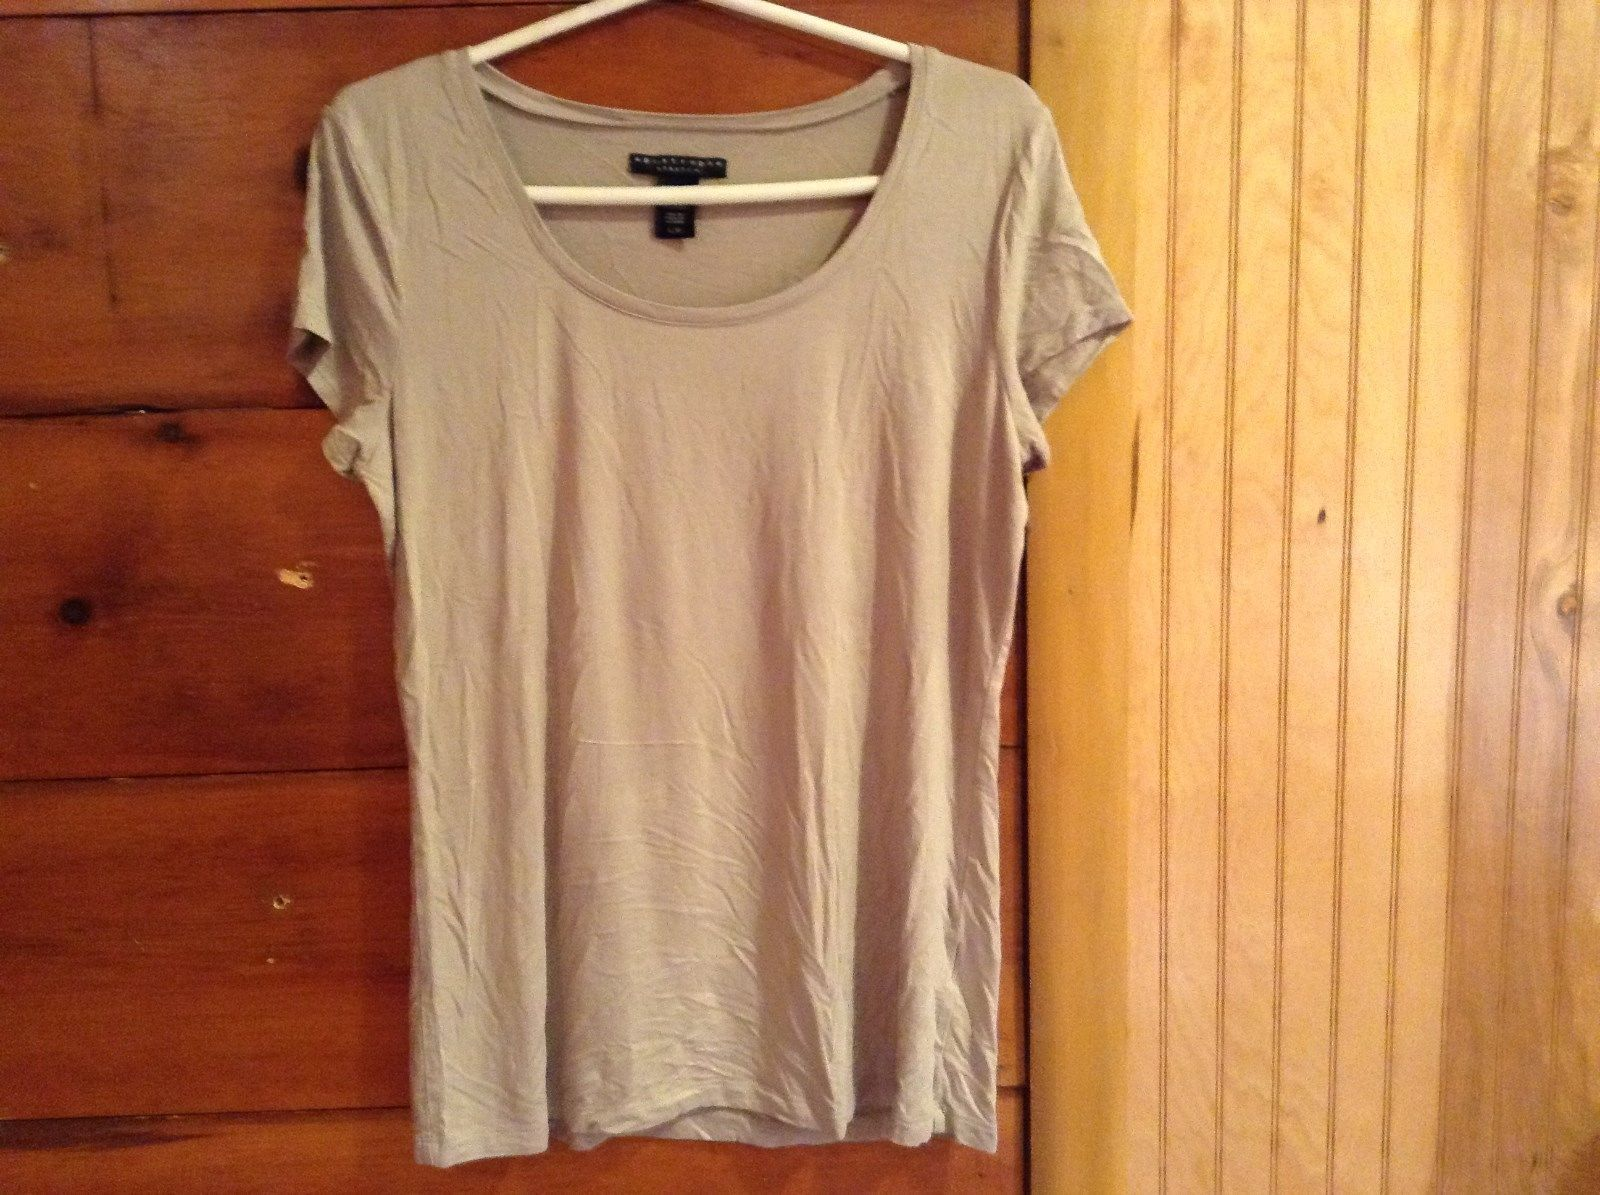 Size Large Apostrophe Stretch Tan Scoop Neck Short Sleeve Shirt